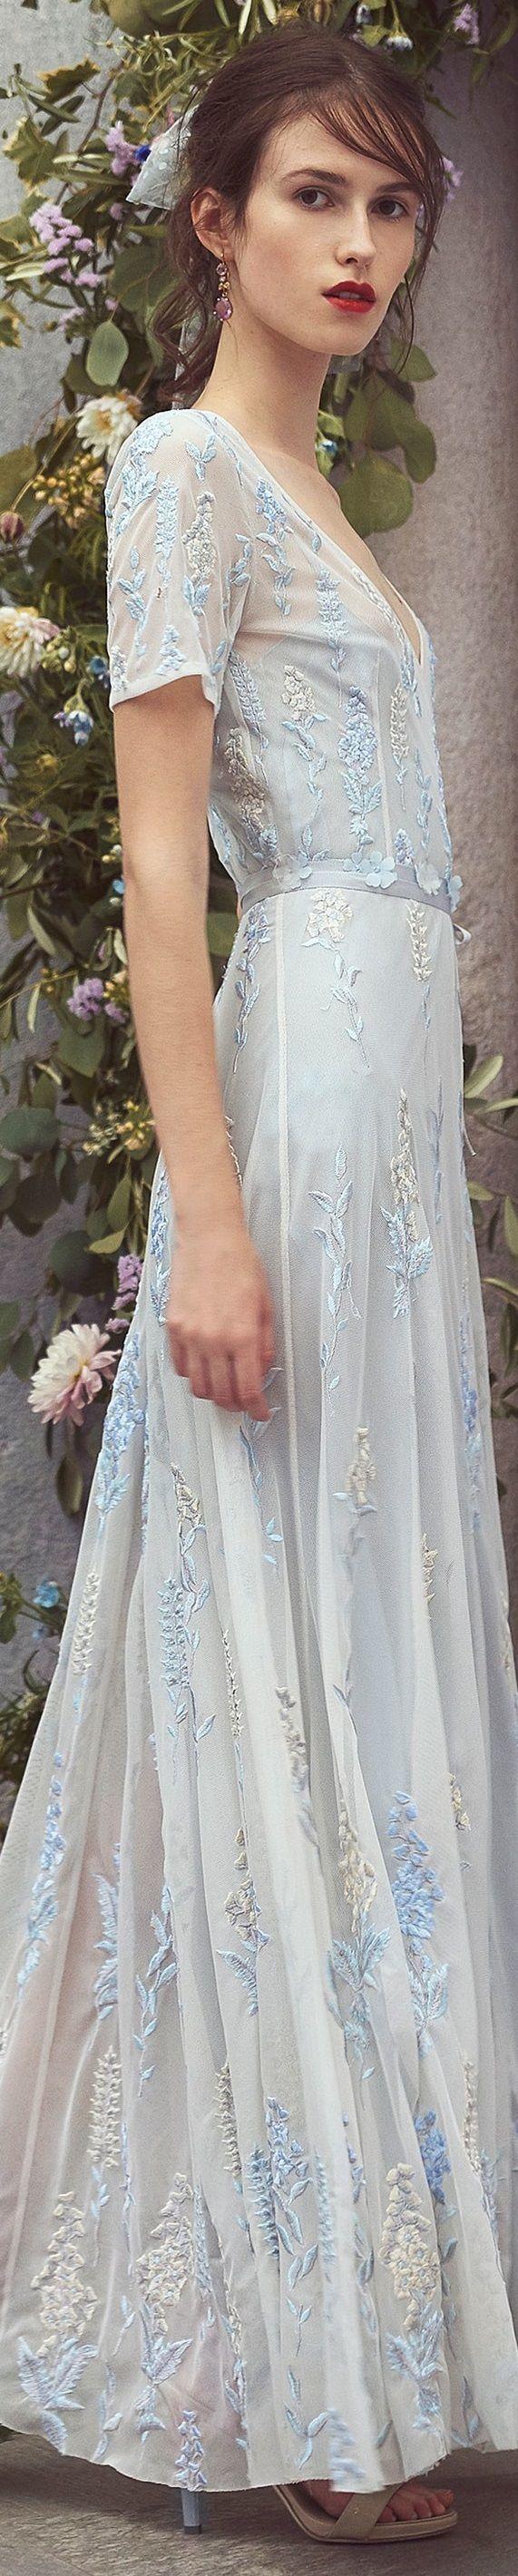 best romance uc images on pinterest clothing apparel fashion